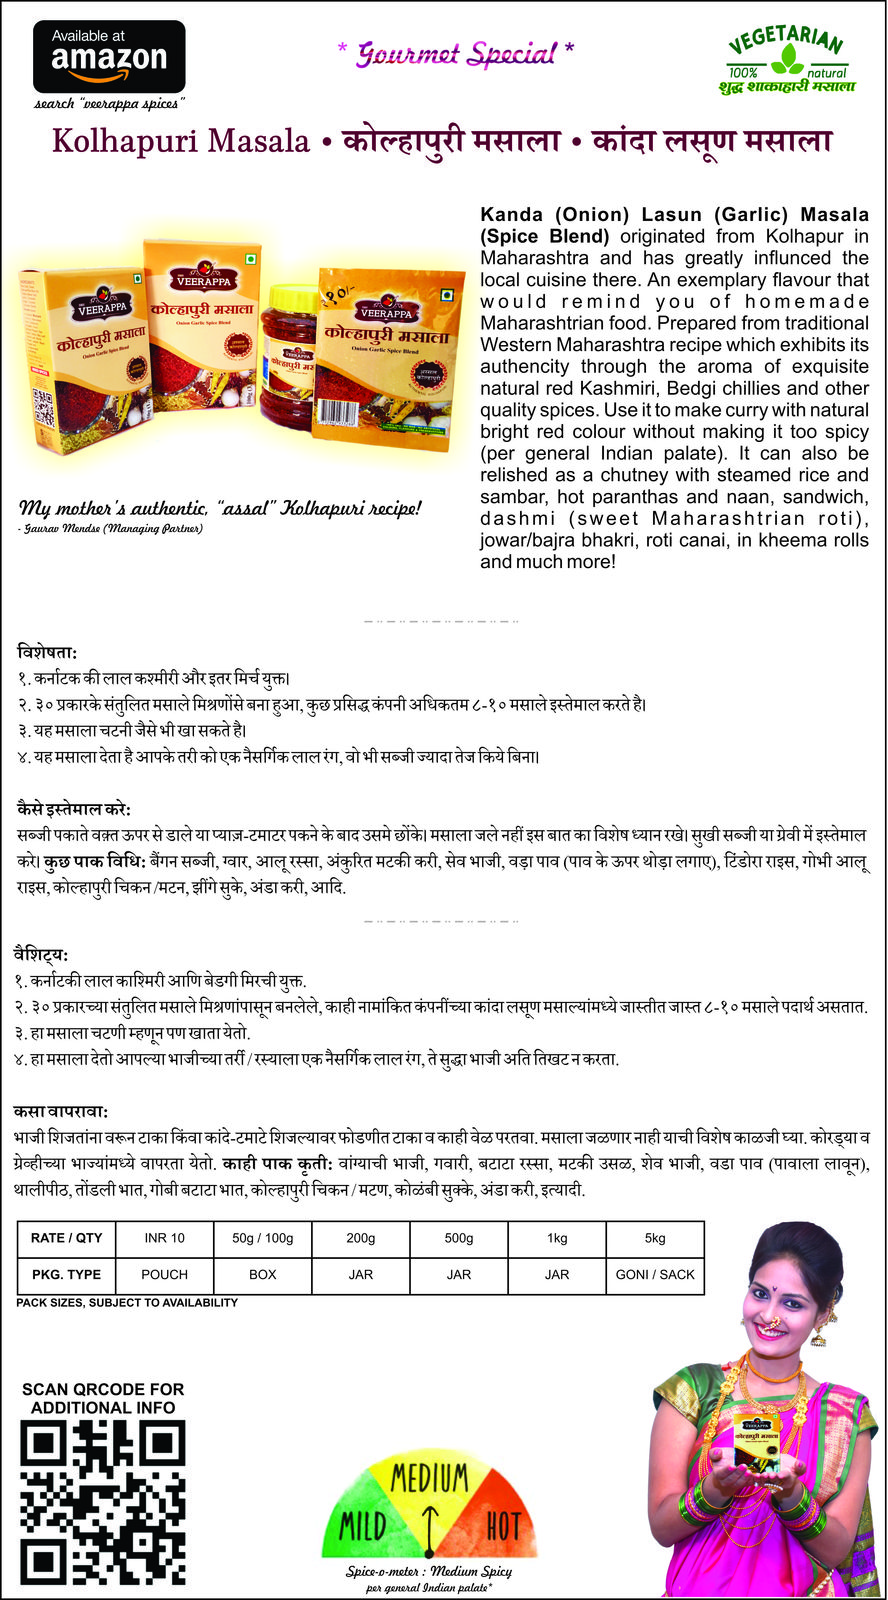 Maharashtrian Masala Box (Pack of 4 masala assortments - Kolhapuri, Goda, Ghati,